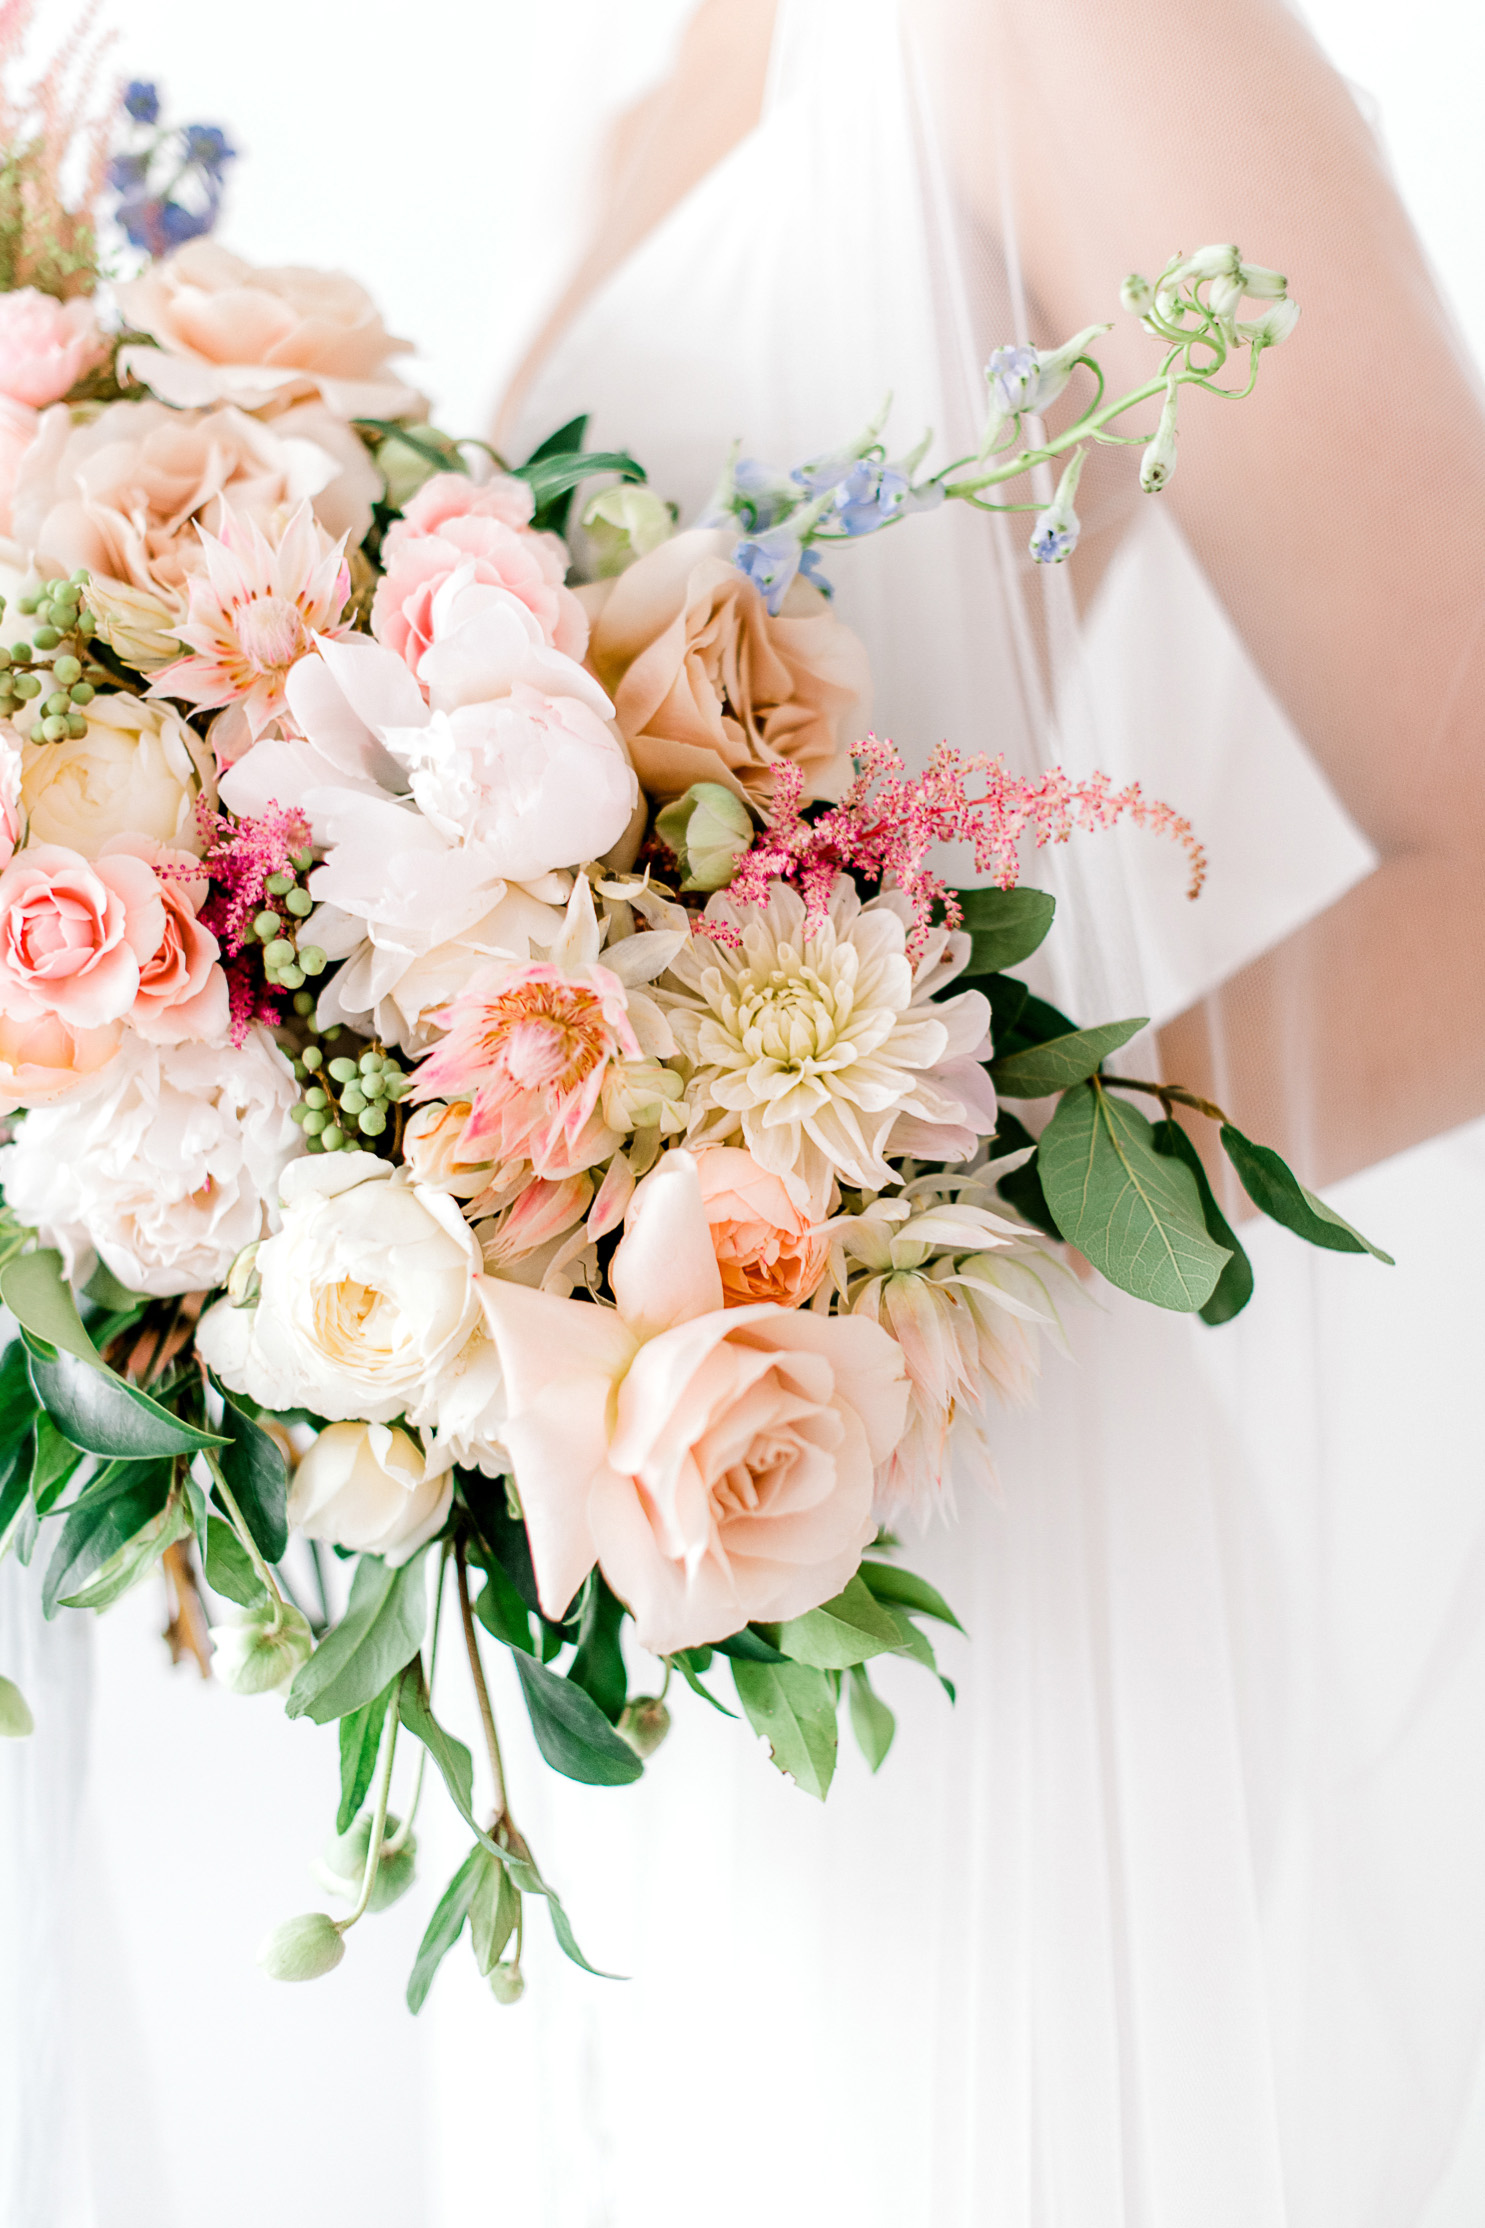 Houston-Wedding-Photographer-Editorial-Fine-Art-Film-Destination-Dallas-Texas-Mibellarosa-Josh-Dana-Fernandez-Photography-227.jpg